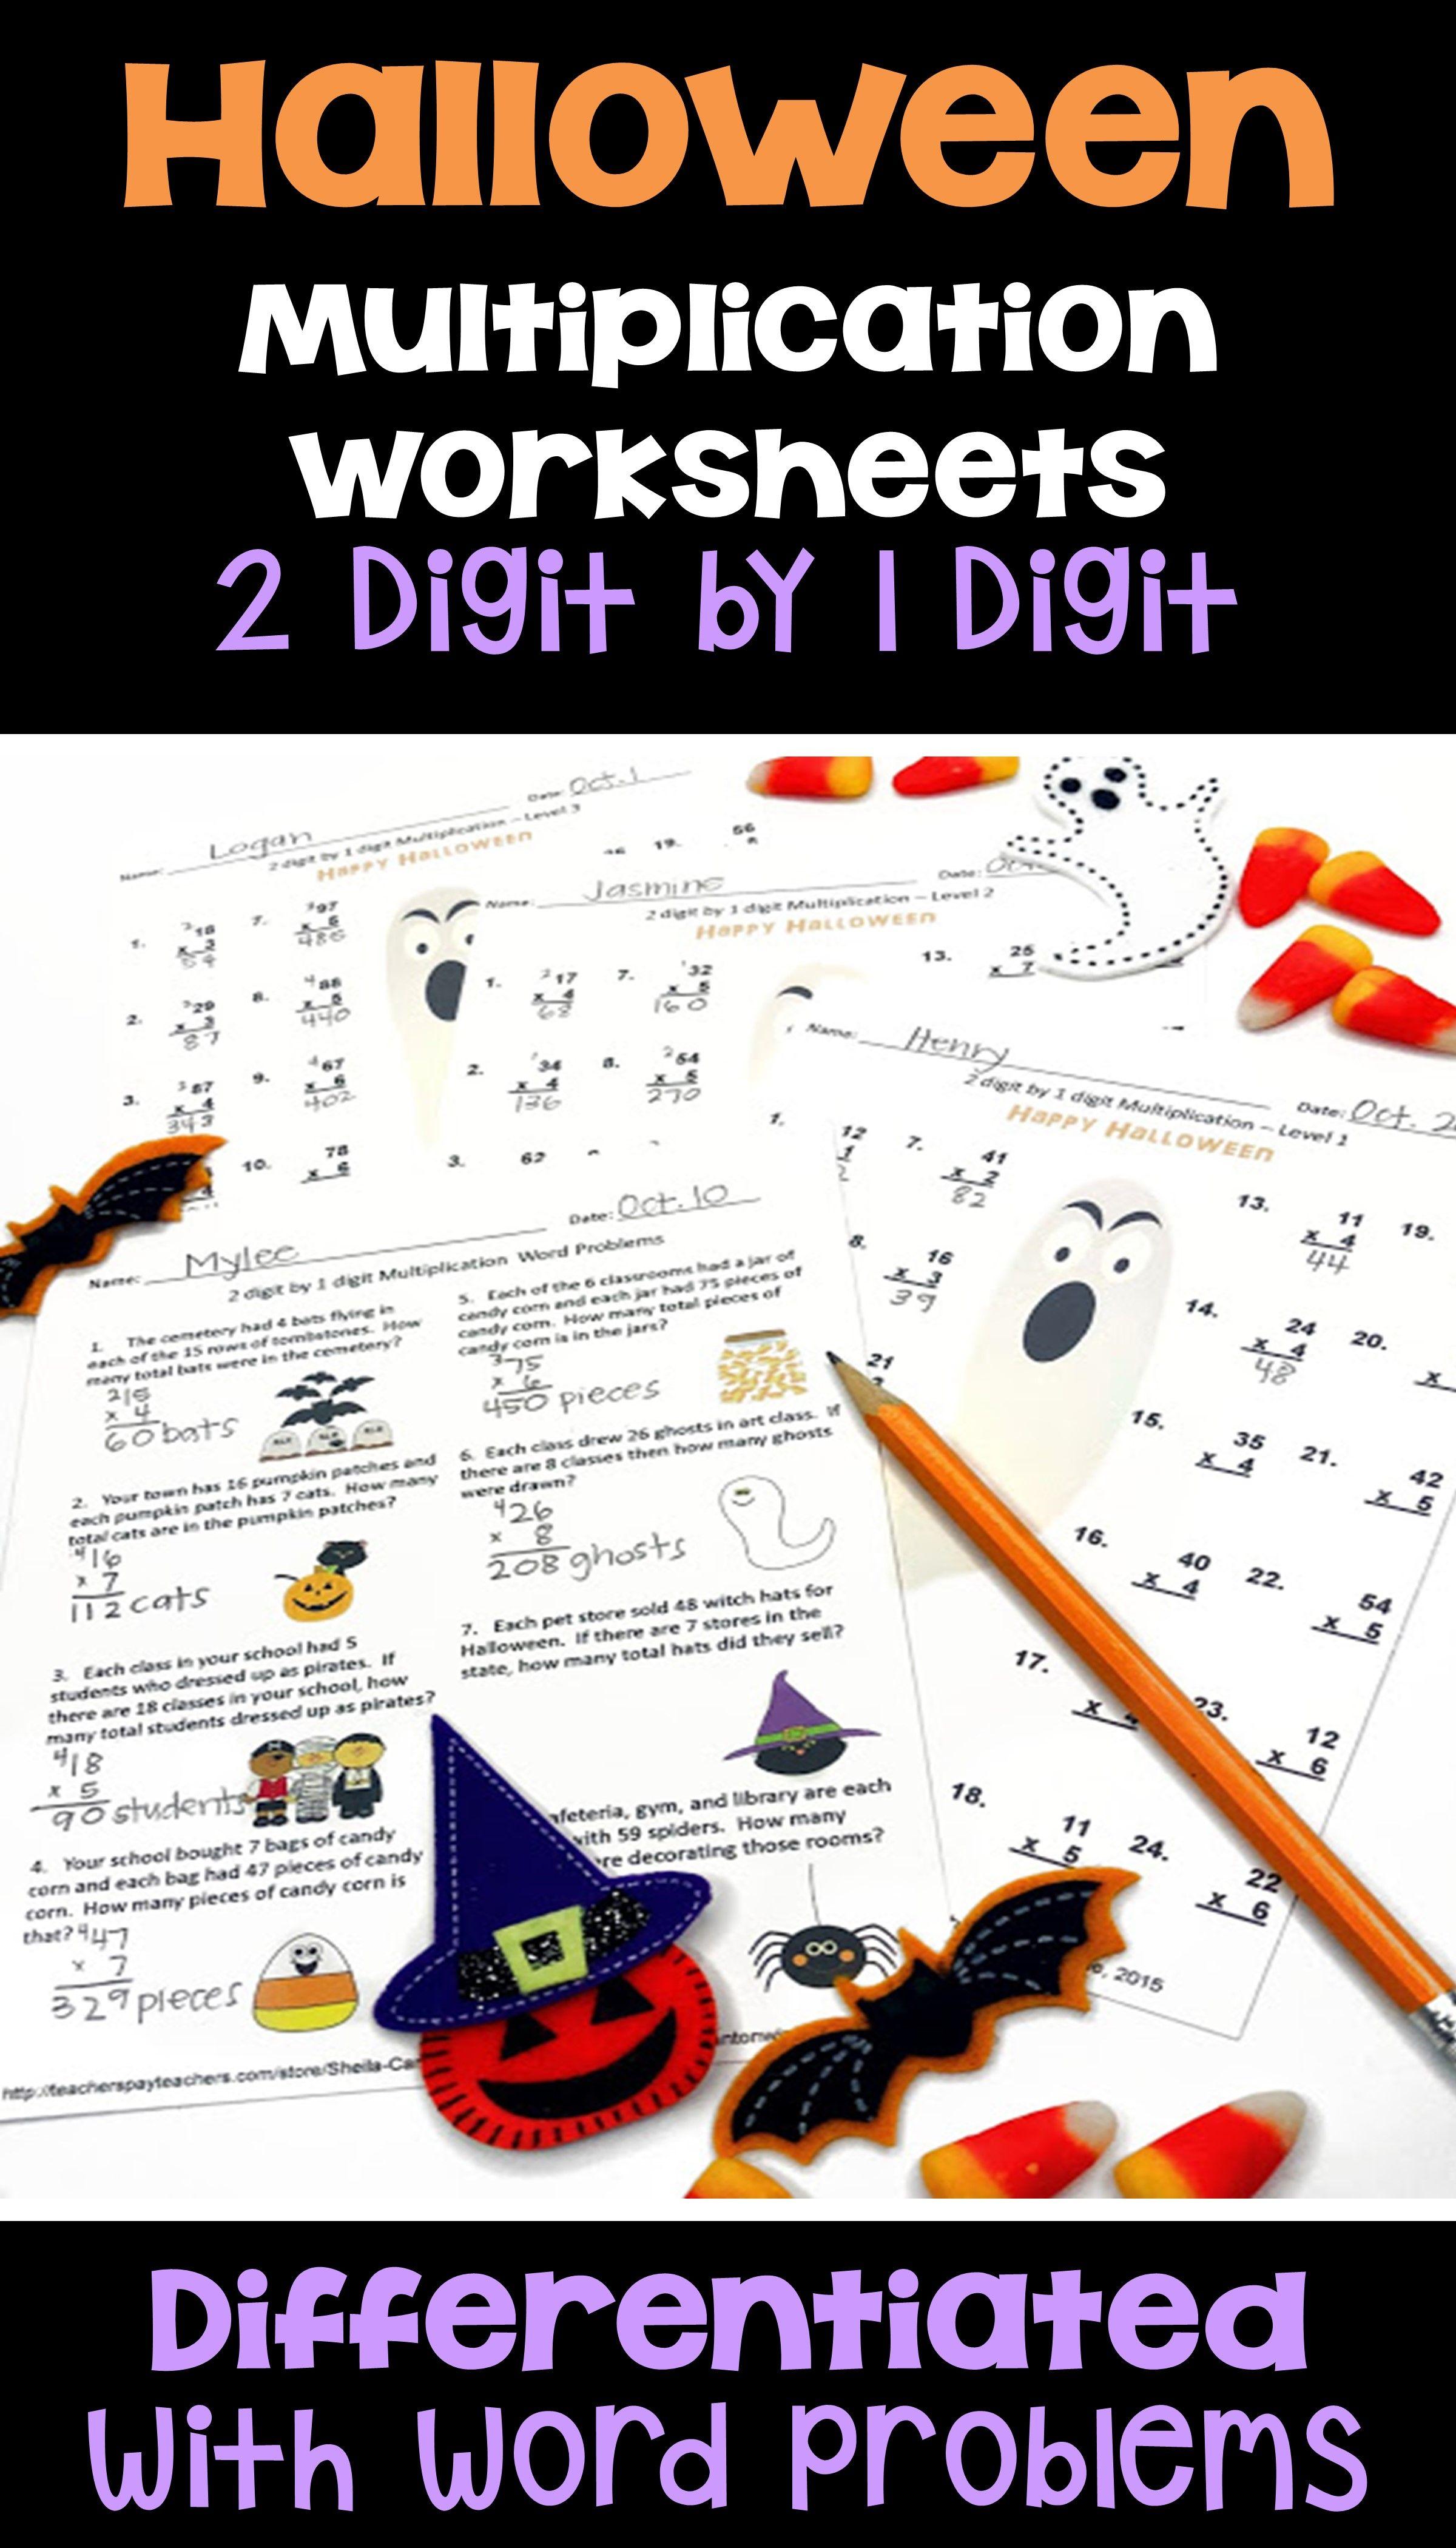 Halloween Math 2 Digit By 1 Digit Multiplication